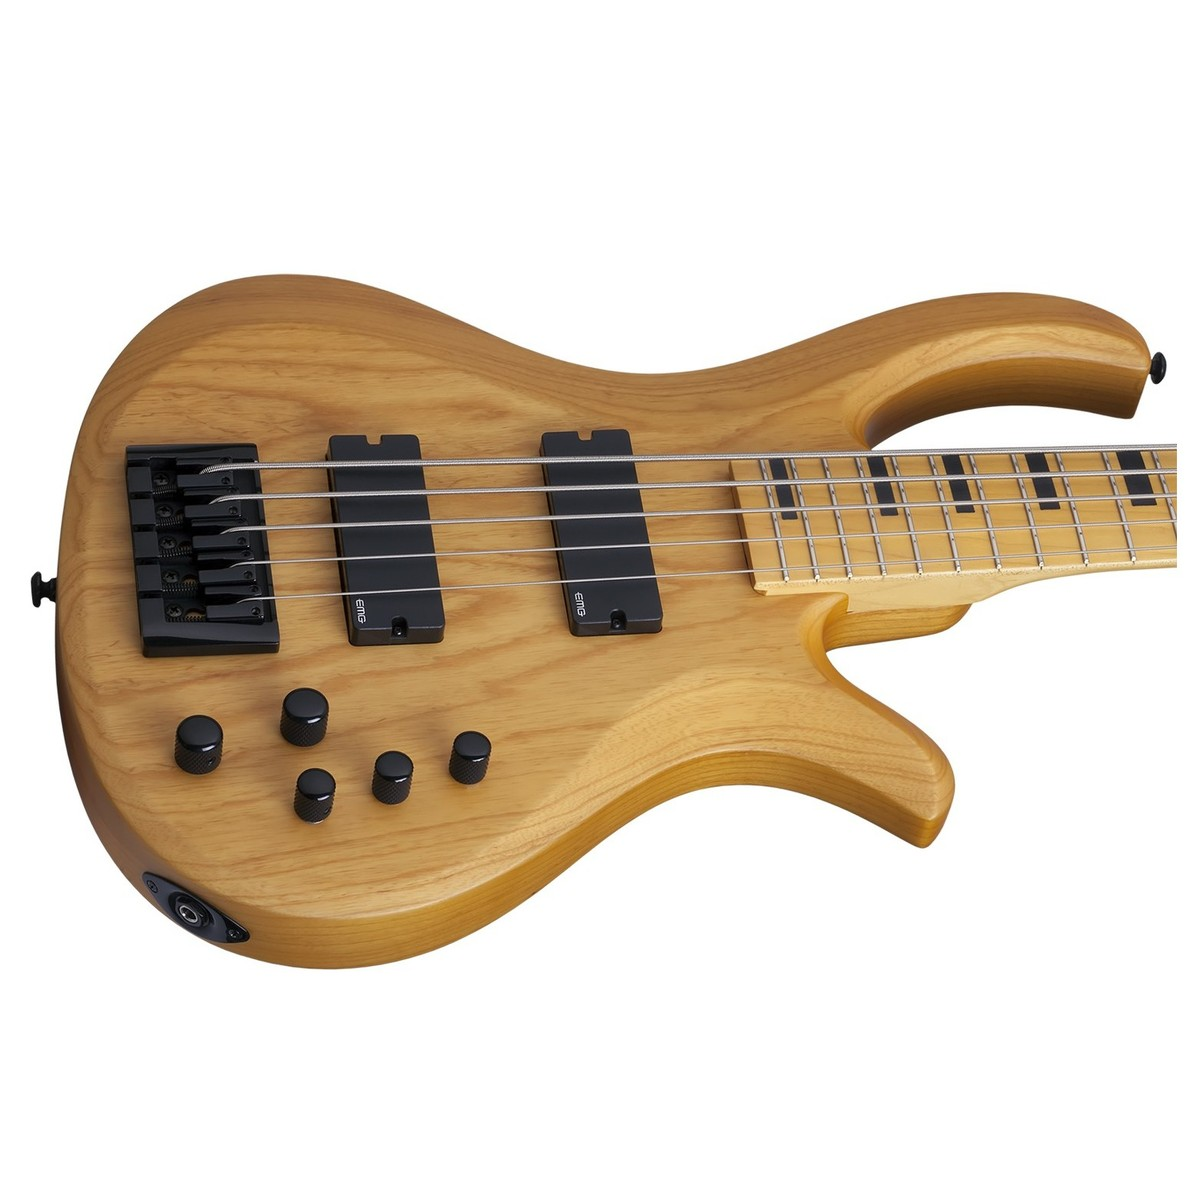 schecter riot session 5 bass guitar aged natural satin at. Black Bedroom Furniture Sets. Home Design Ideas